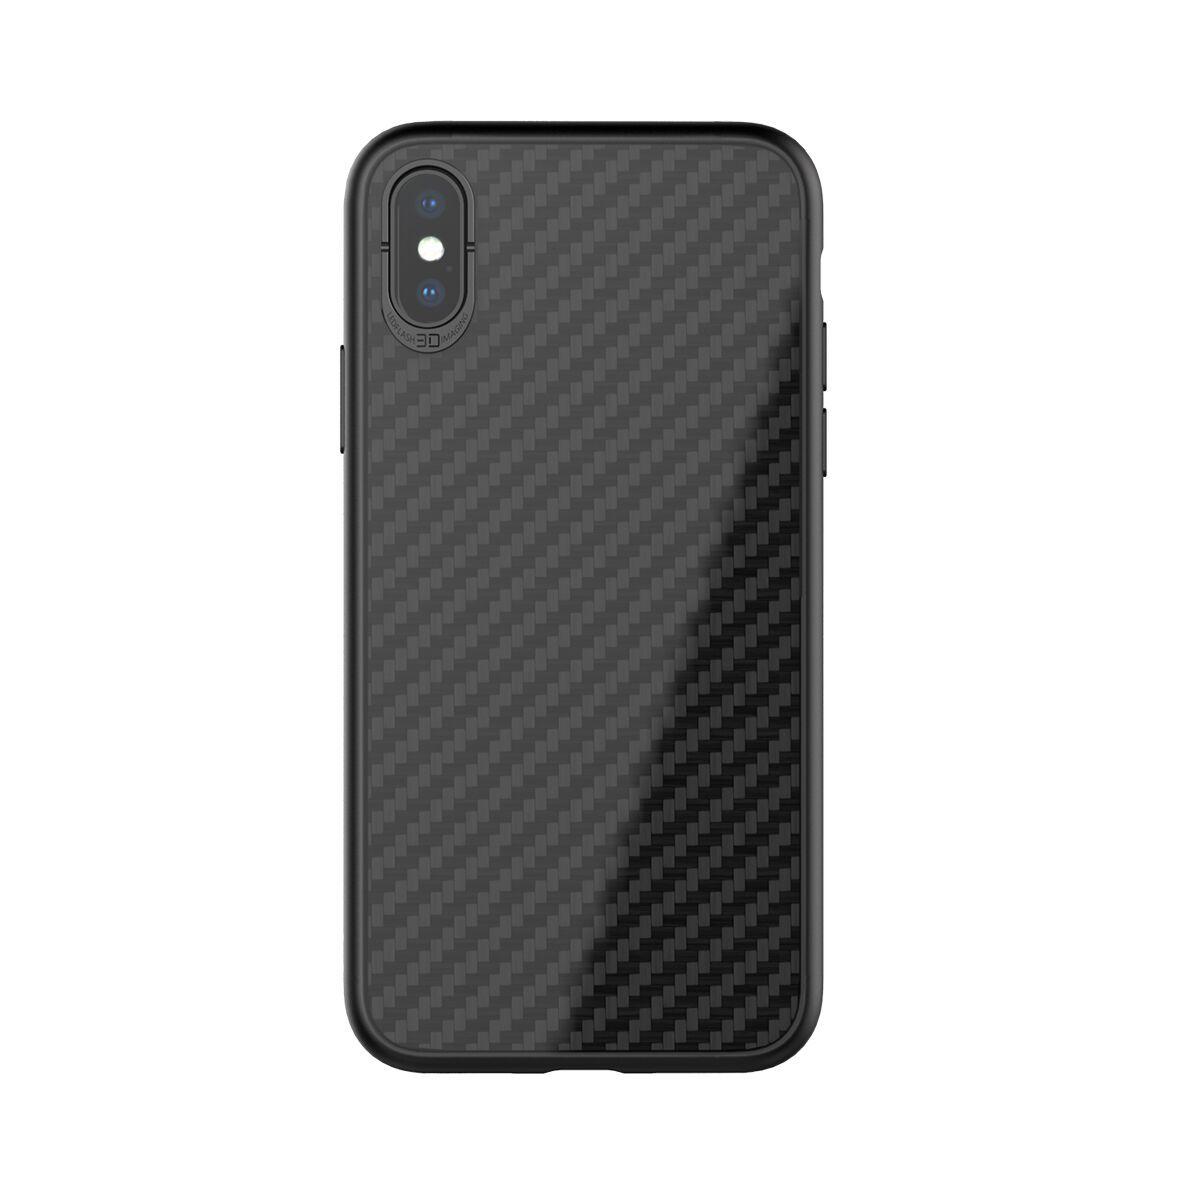 Blackleaf Case Iphone X Iphone 10 Ultra Slim Carbon Fiber Cover Image 1x1 Trans On Https Www Casefanatic Com